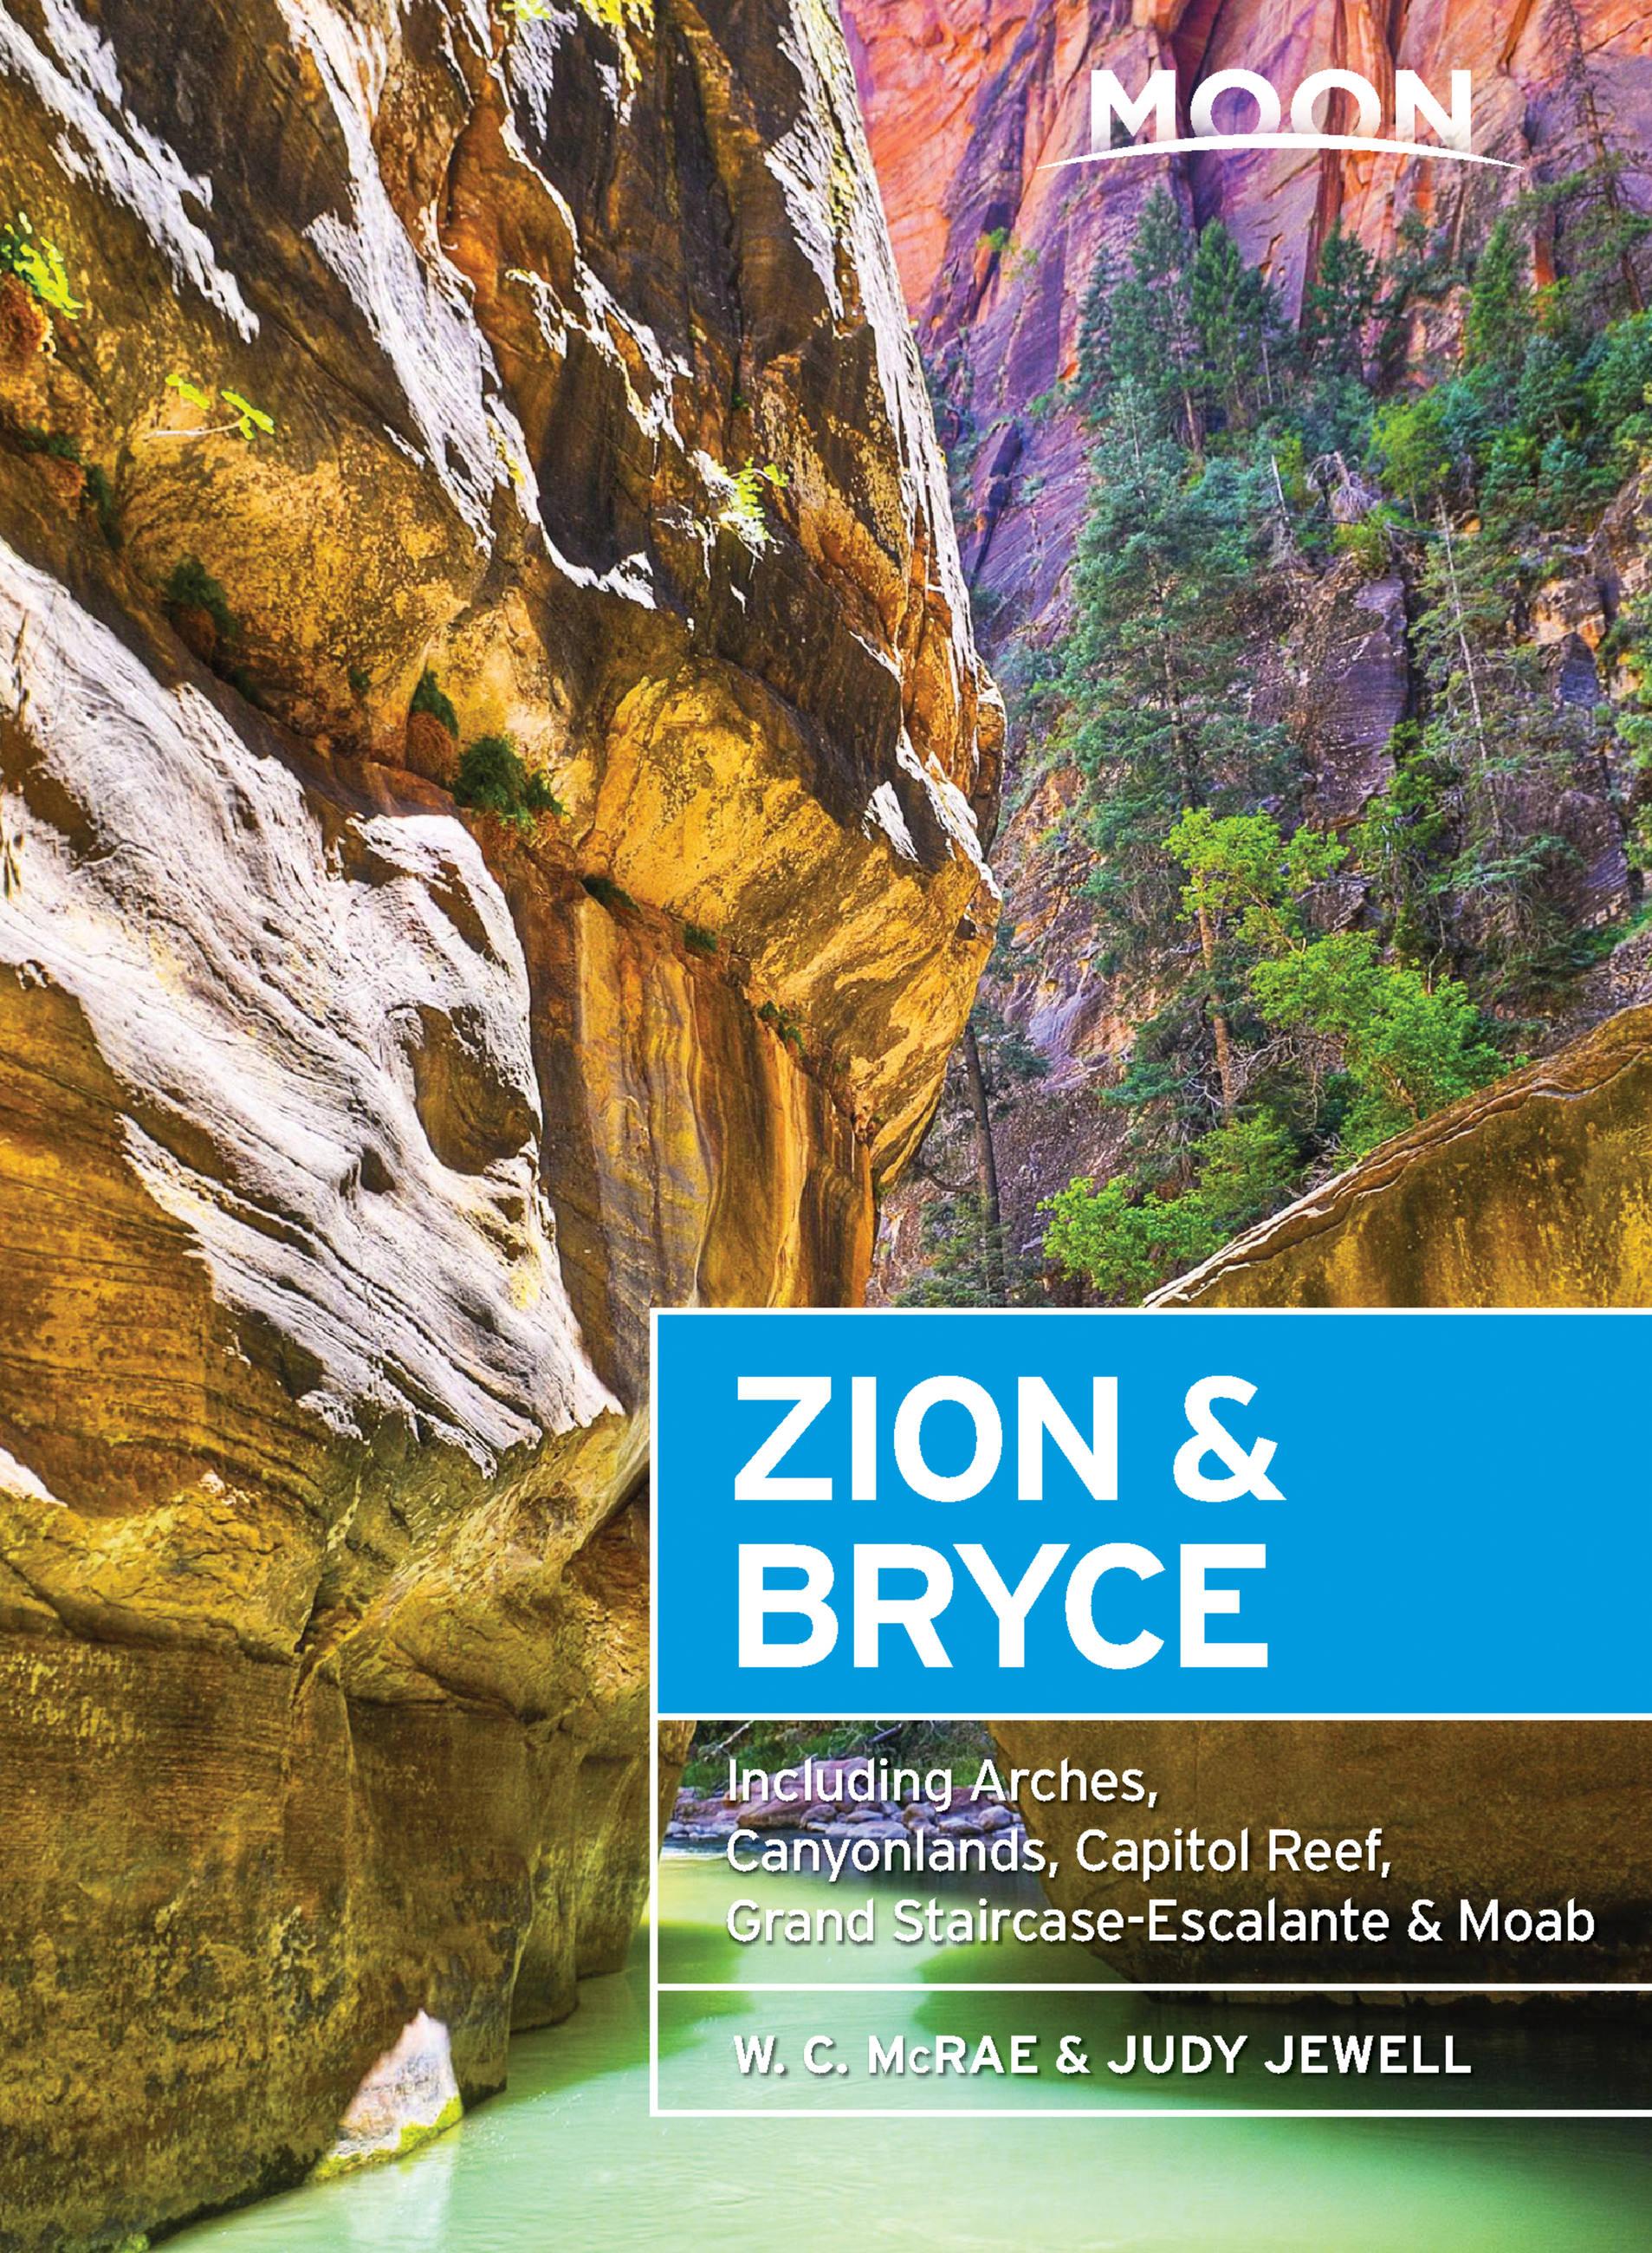 Moon Zion & Bryce